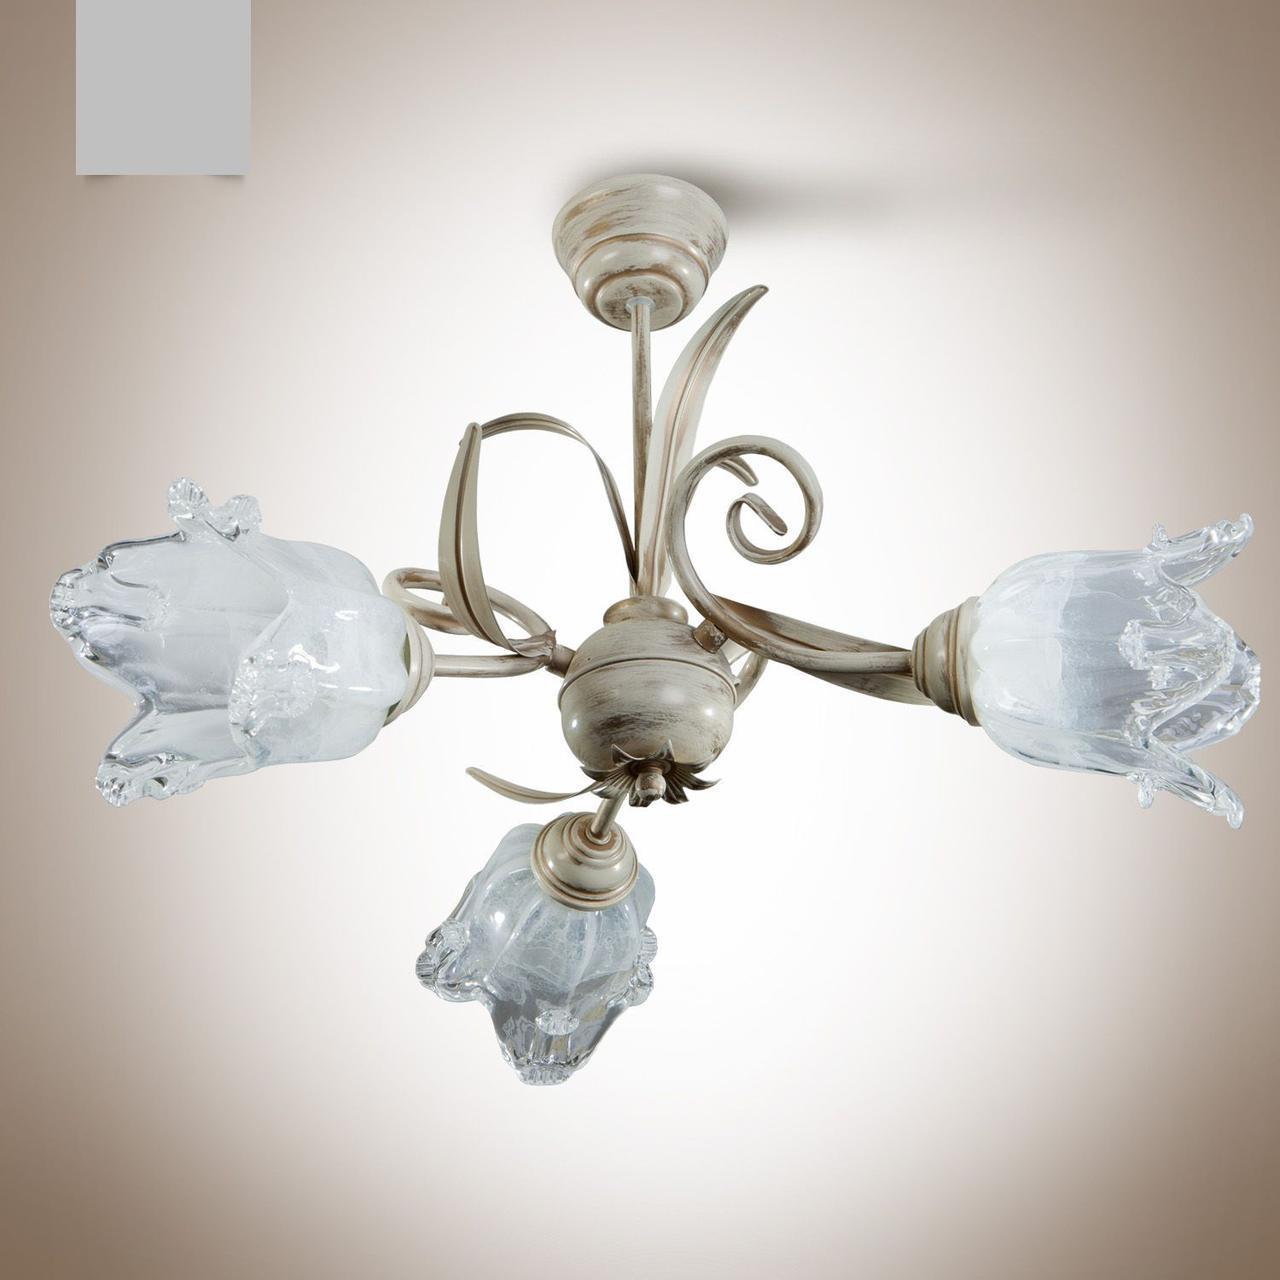 Люстра в стиле флористика для спальни, для зала 3-х ламповая  213-4